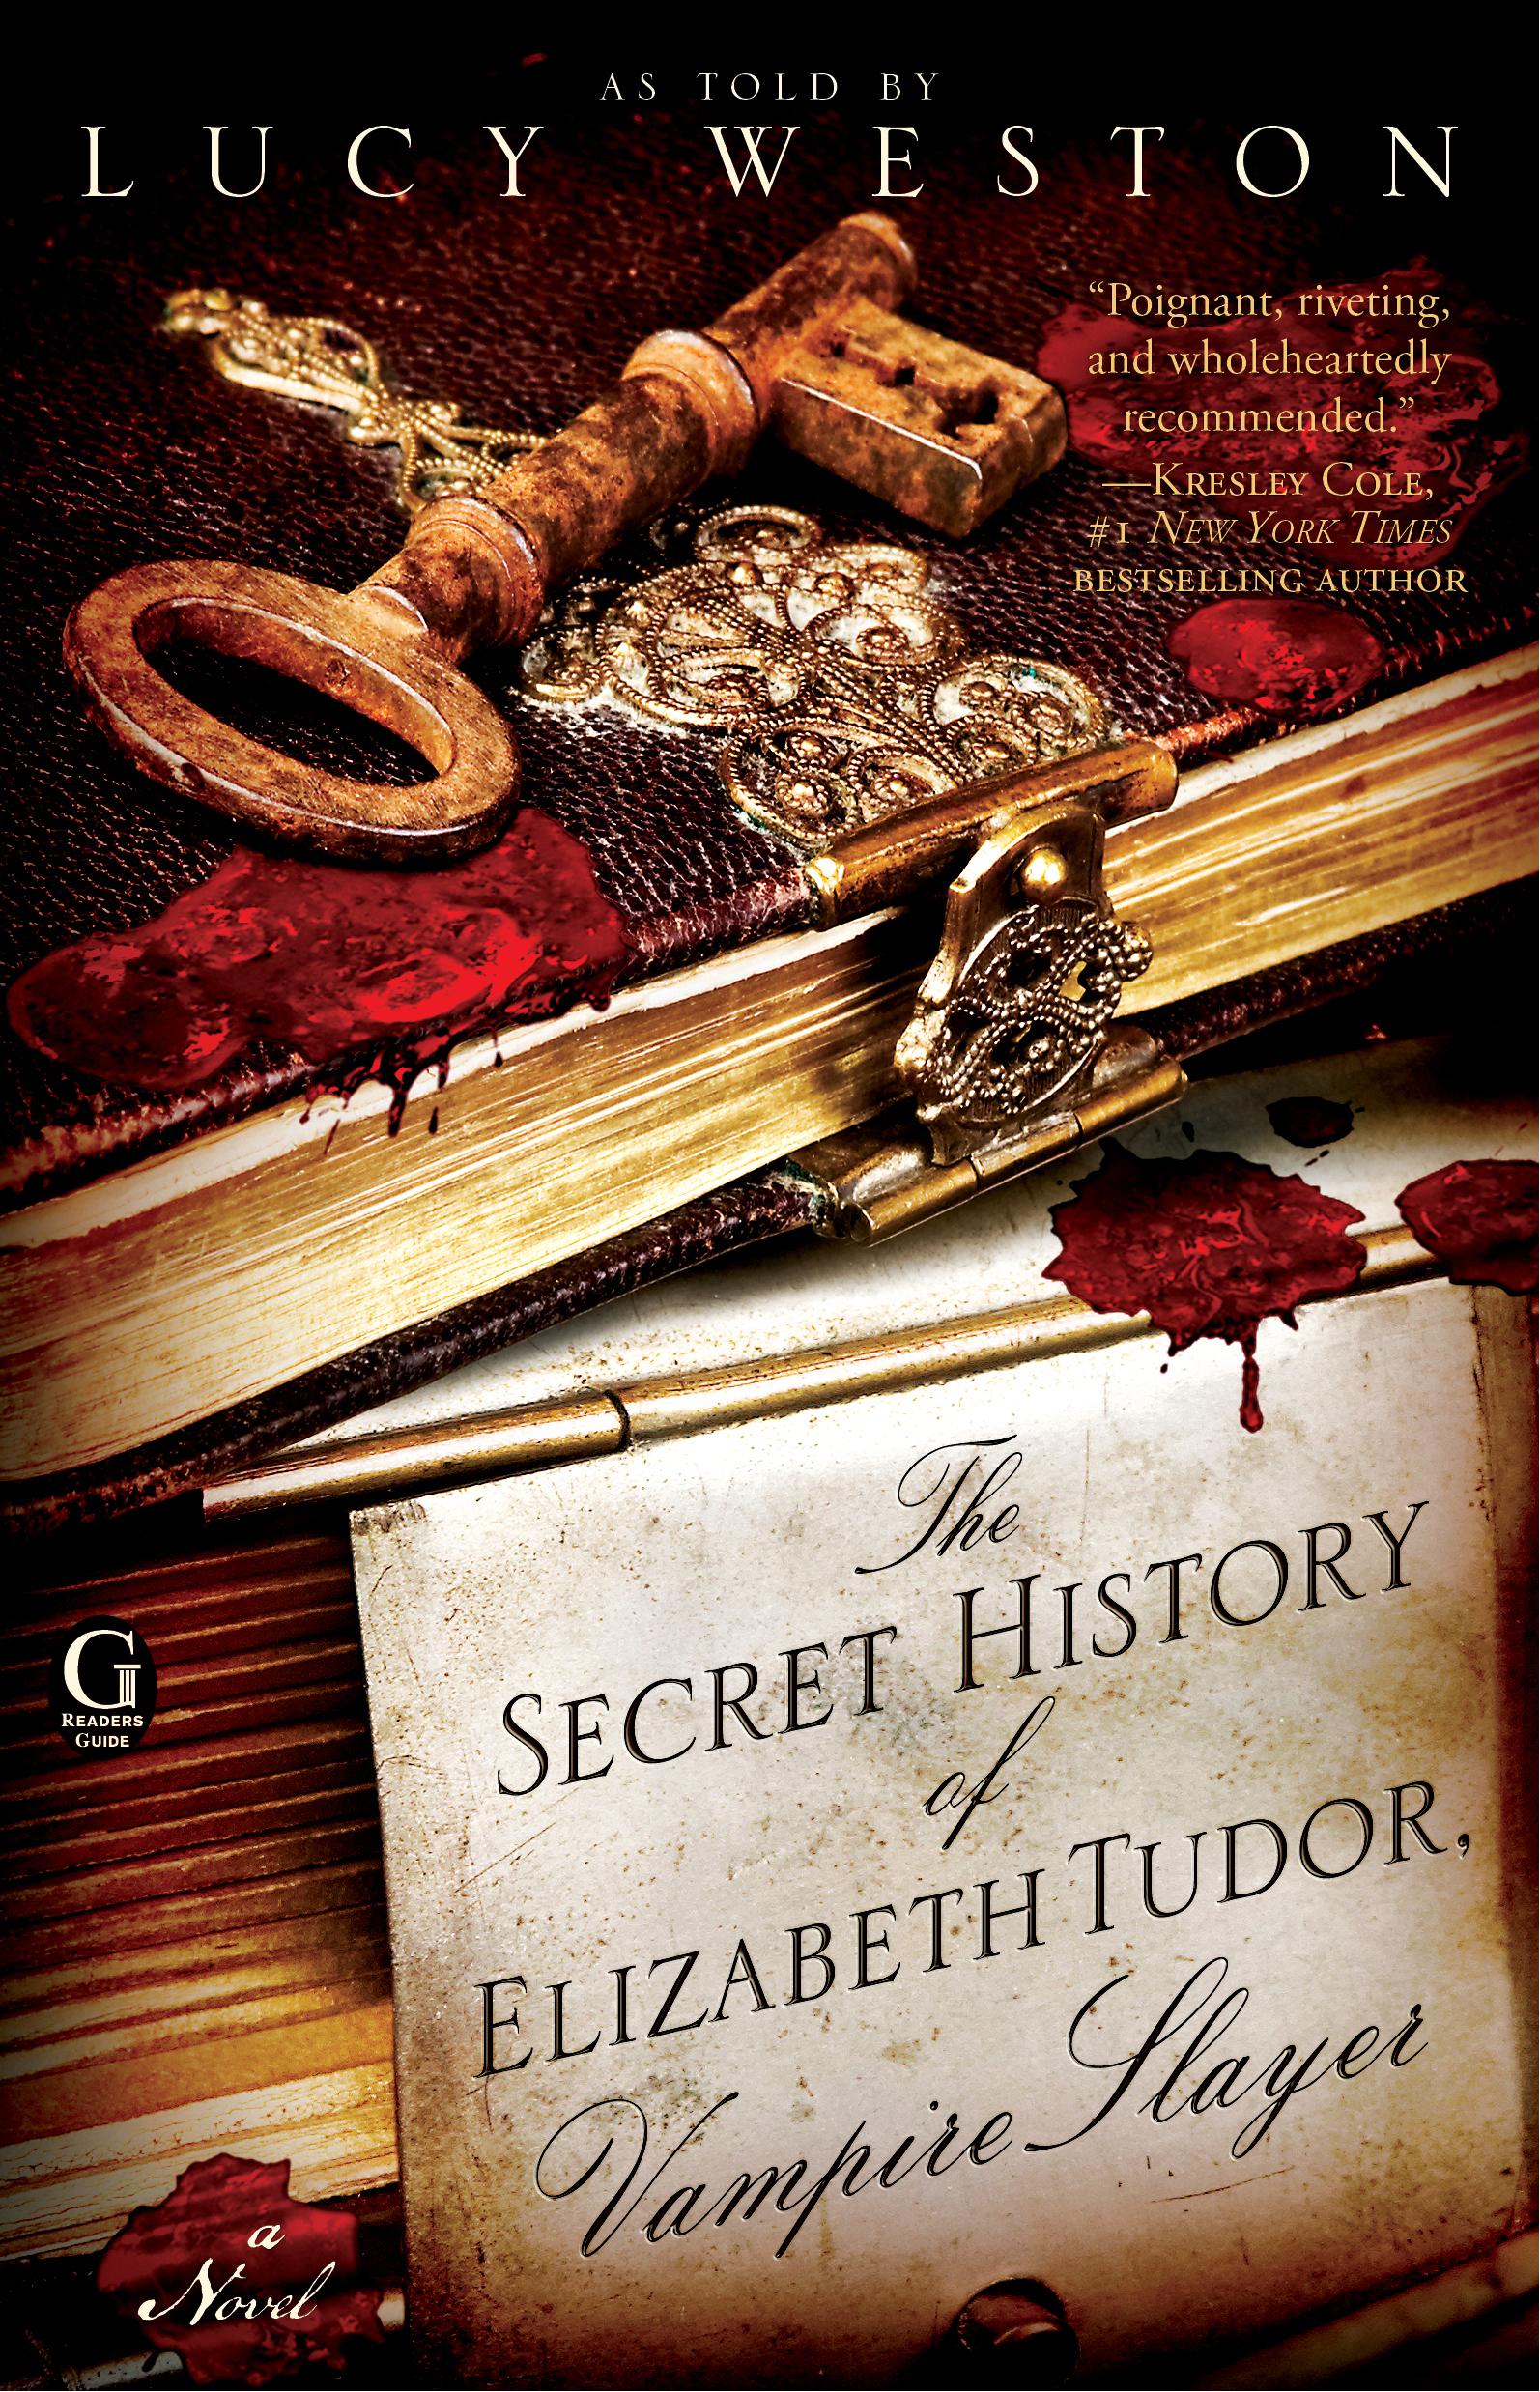 The Secret History of Elizabeth Tudor Vampire Slayer